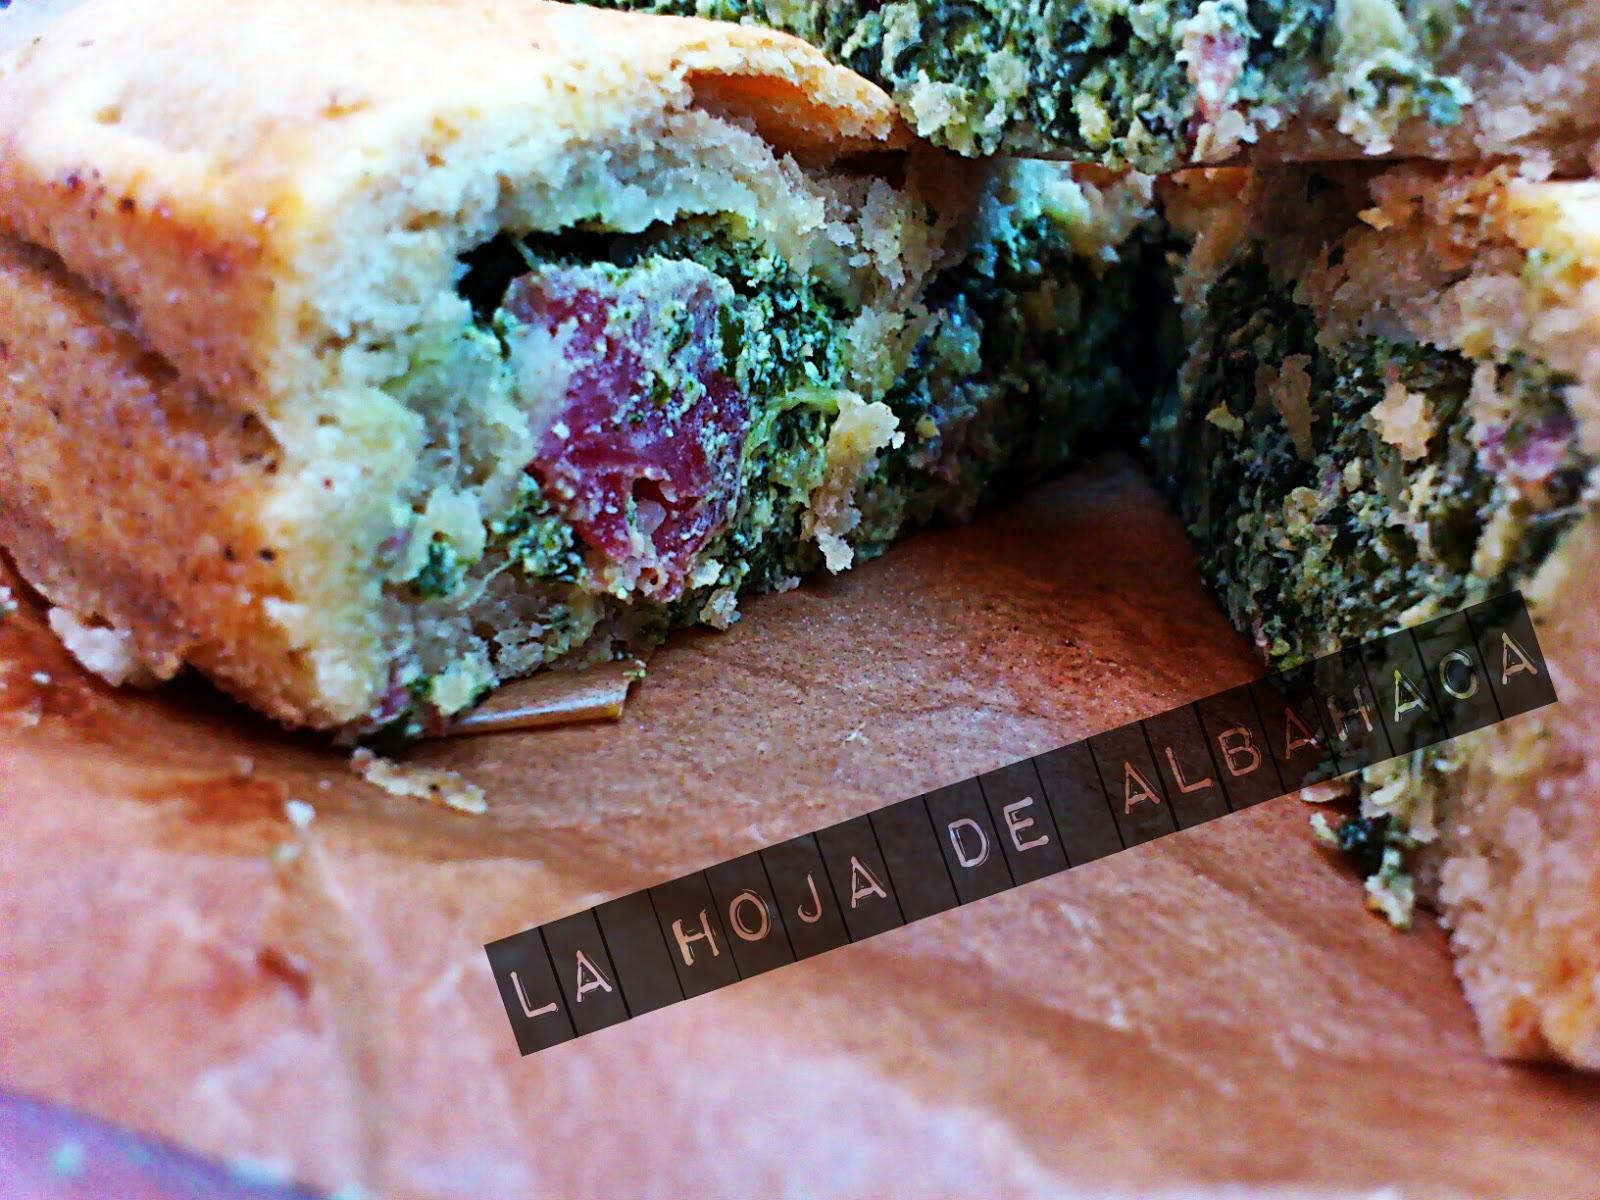 tortam acelga, espinacas, queso ricotta, queso parmesano, fontina, harina ecológica , Mulino Marino, La tienda de La hoja